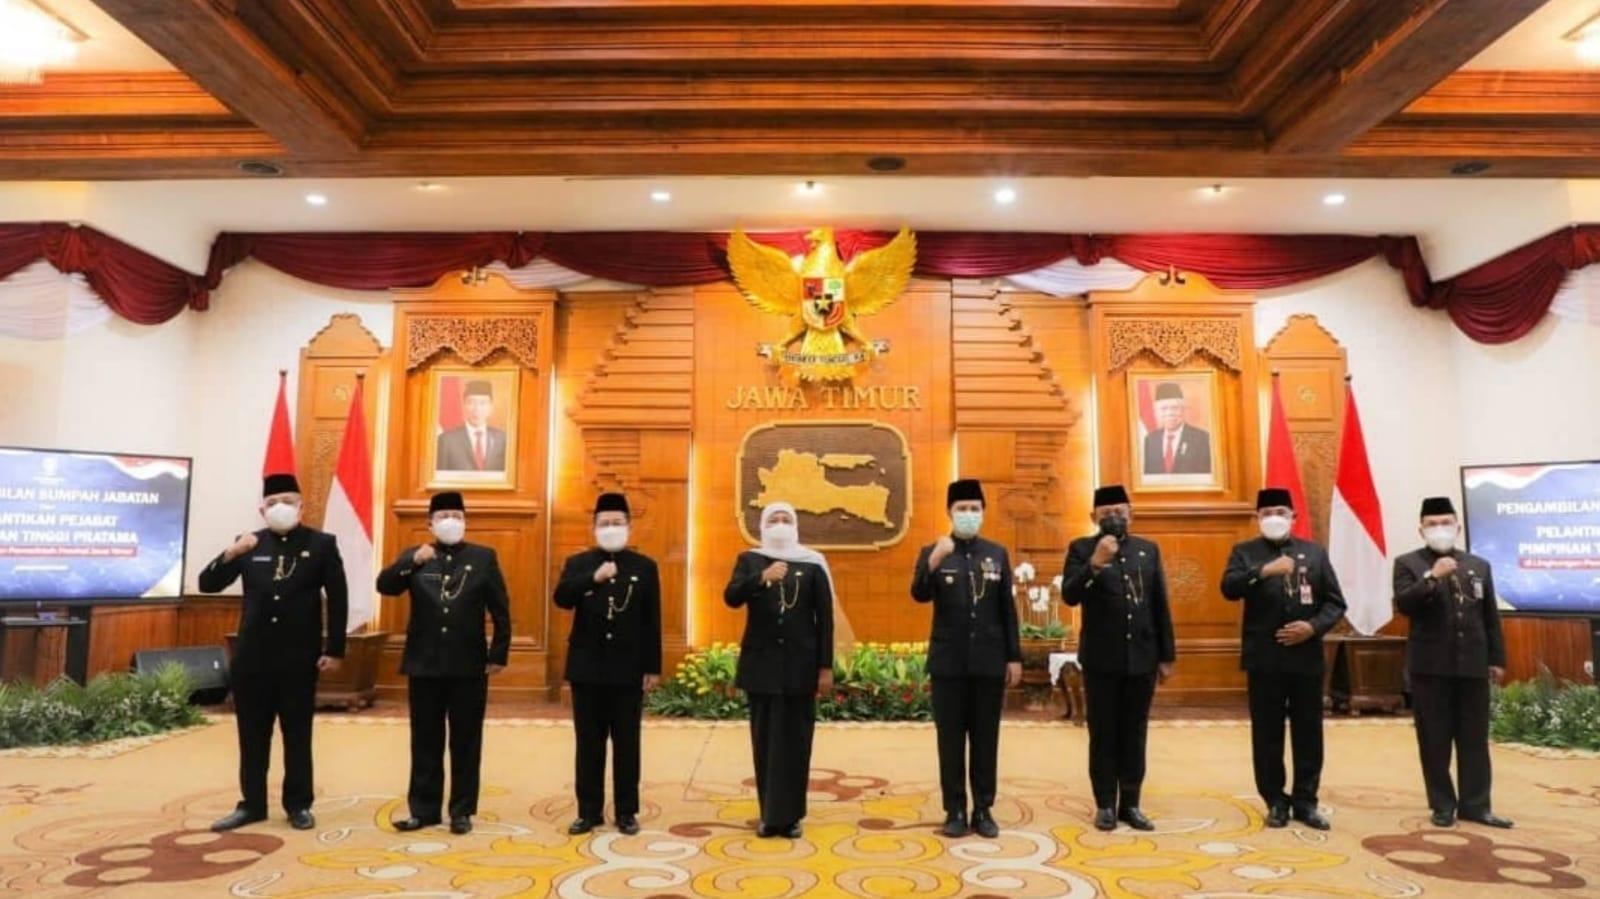 Gubernur Jatim Lantik Lima Orang Pejabat Eselon II di Grahadi Surabaya